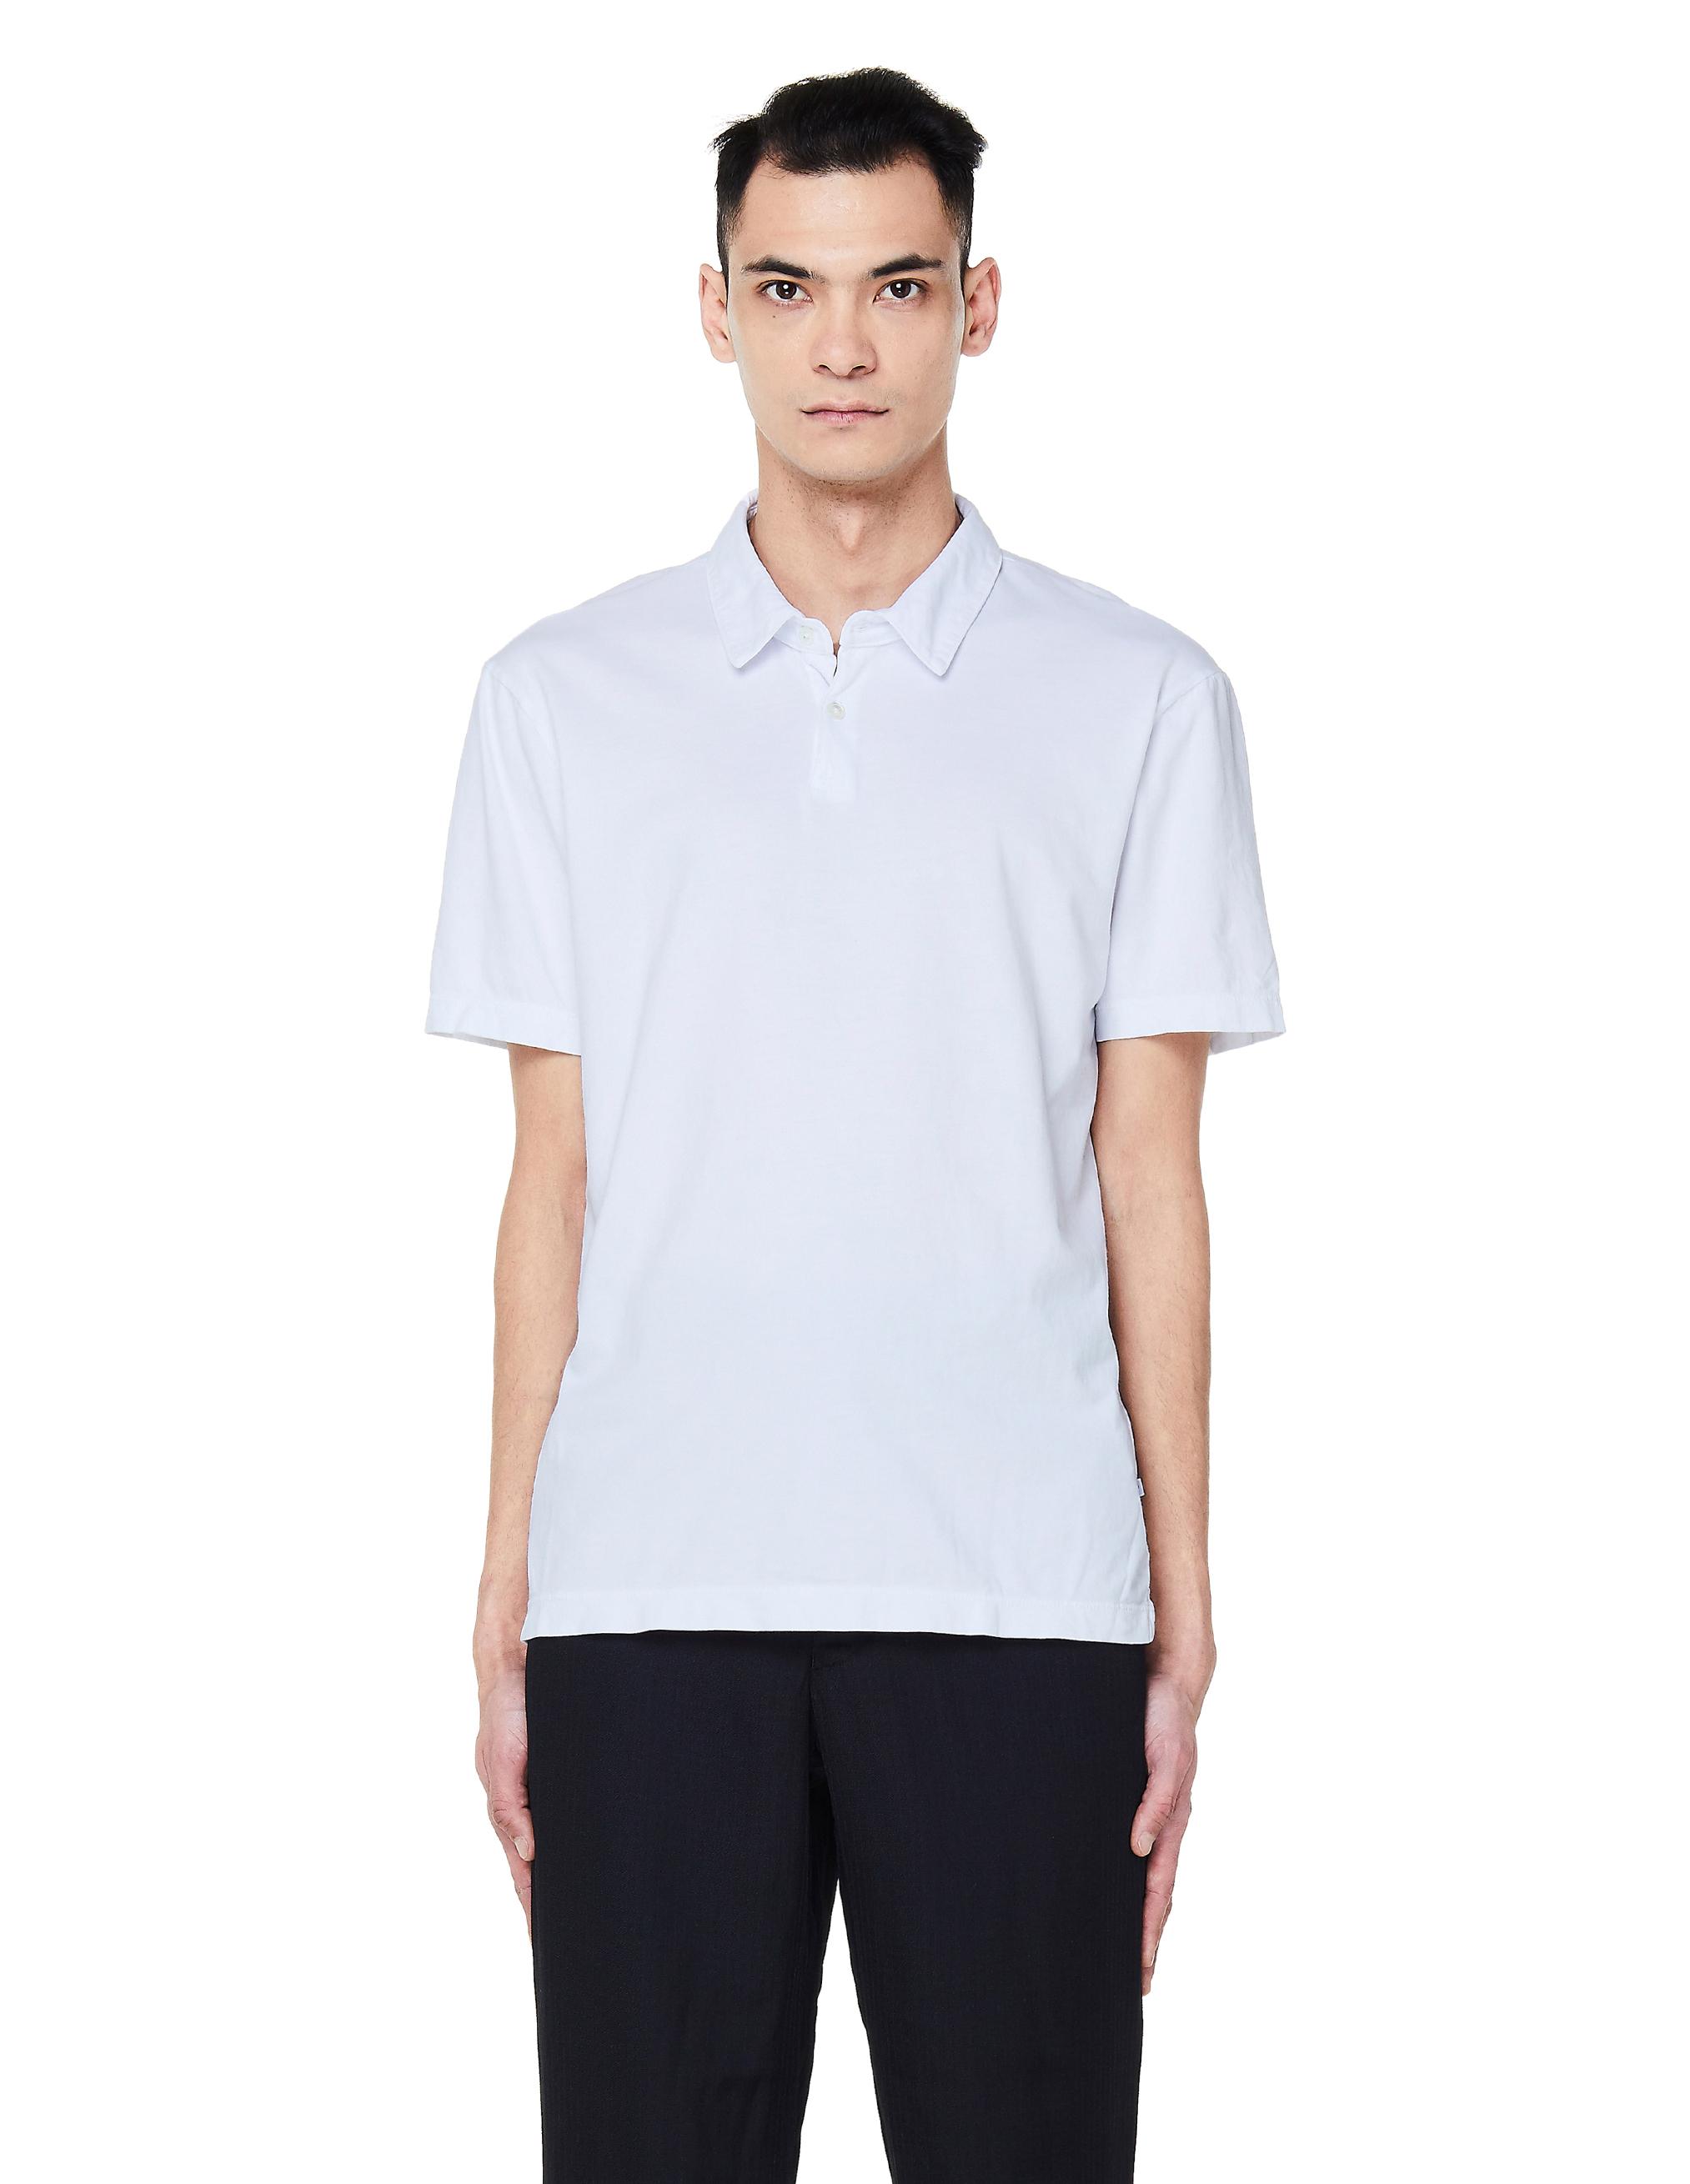 James Perse White Cotton Polo T-Shirt